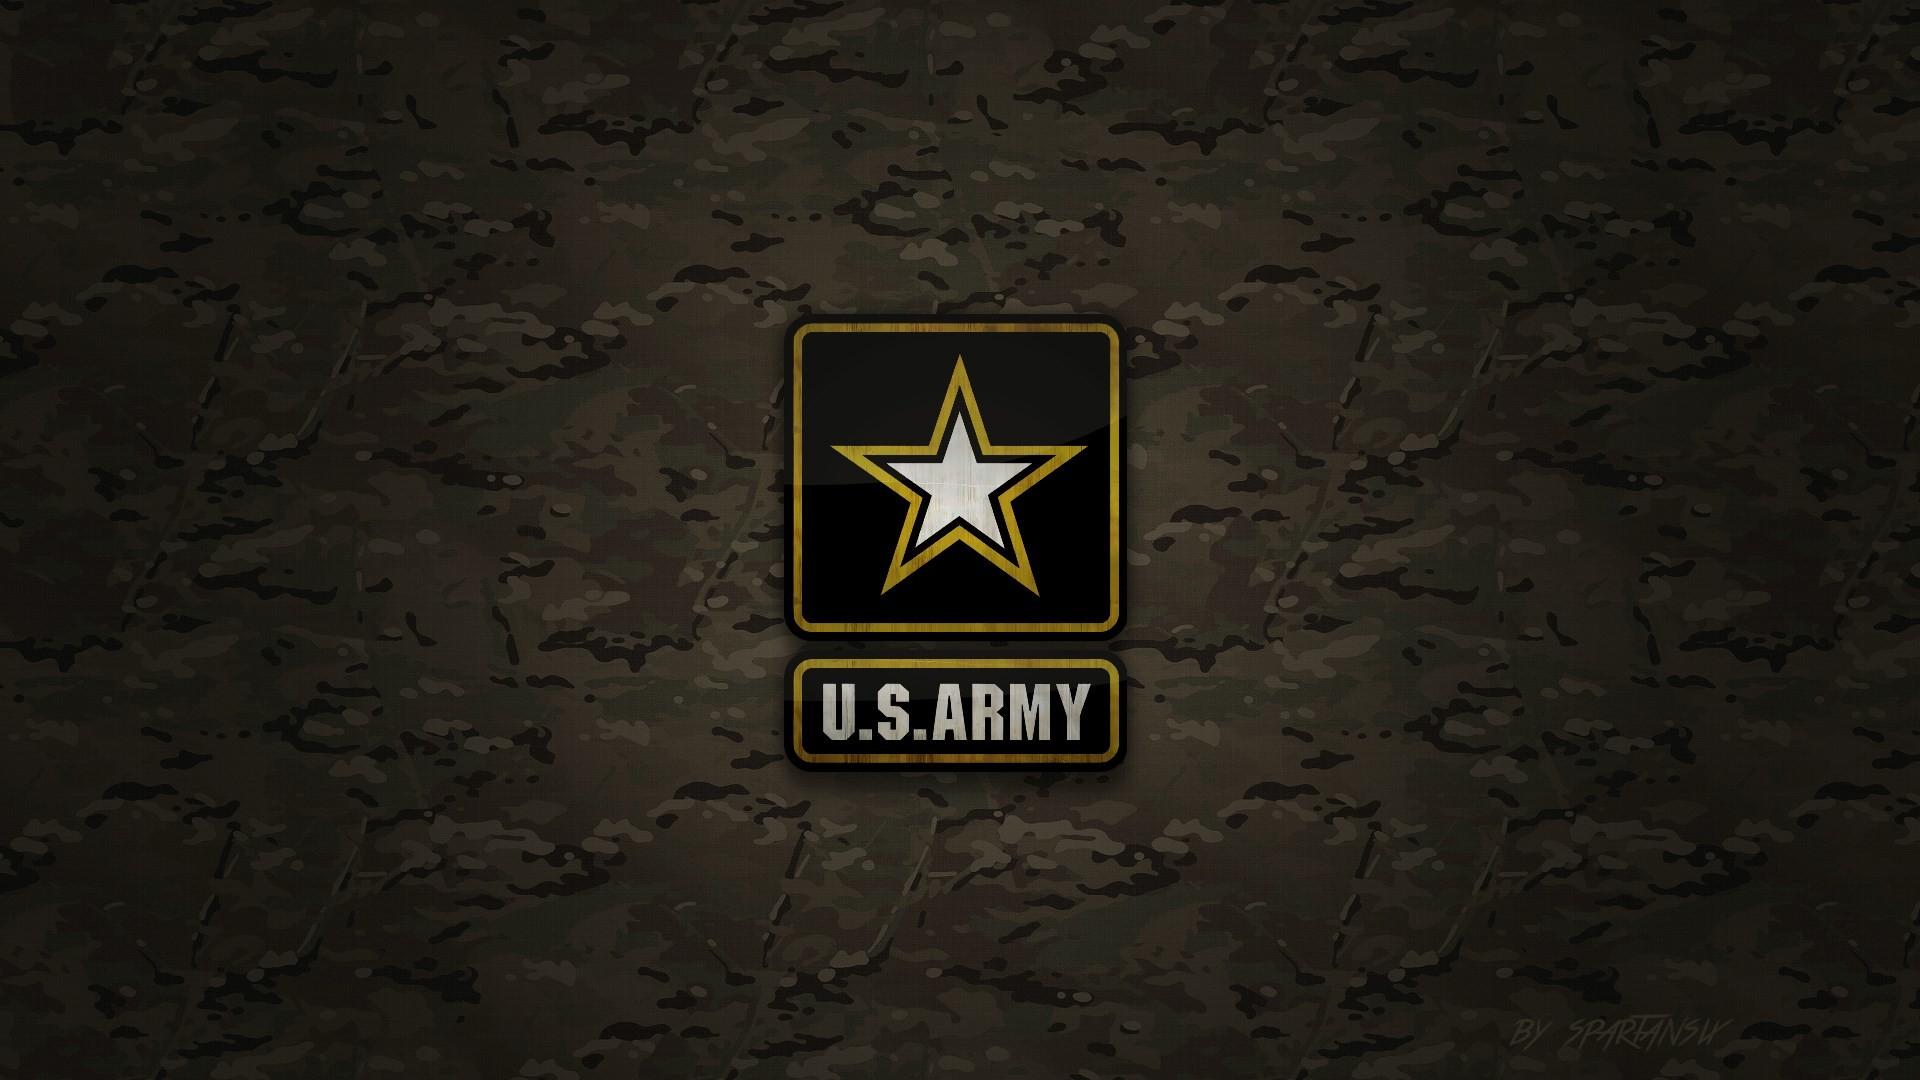 Us navy images logo wallpaper 54 images 3000x2000 ipad voltagebd Images